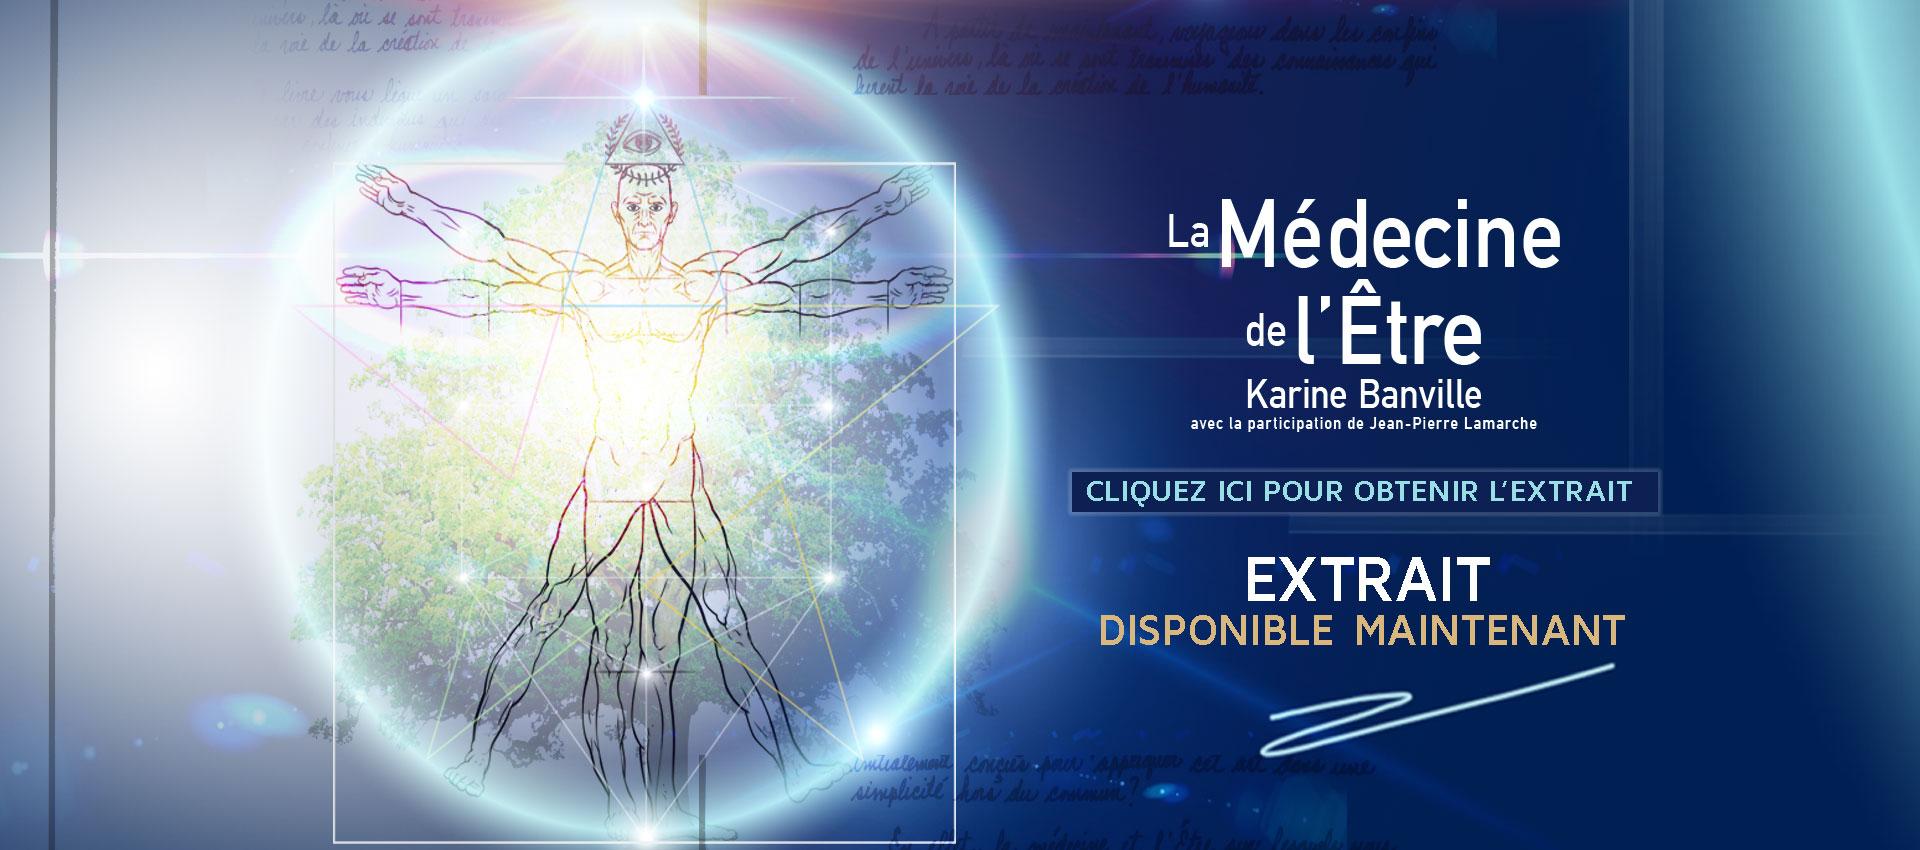 extrait-livre-medecine2